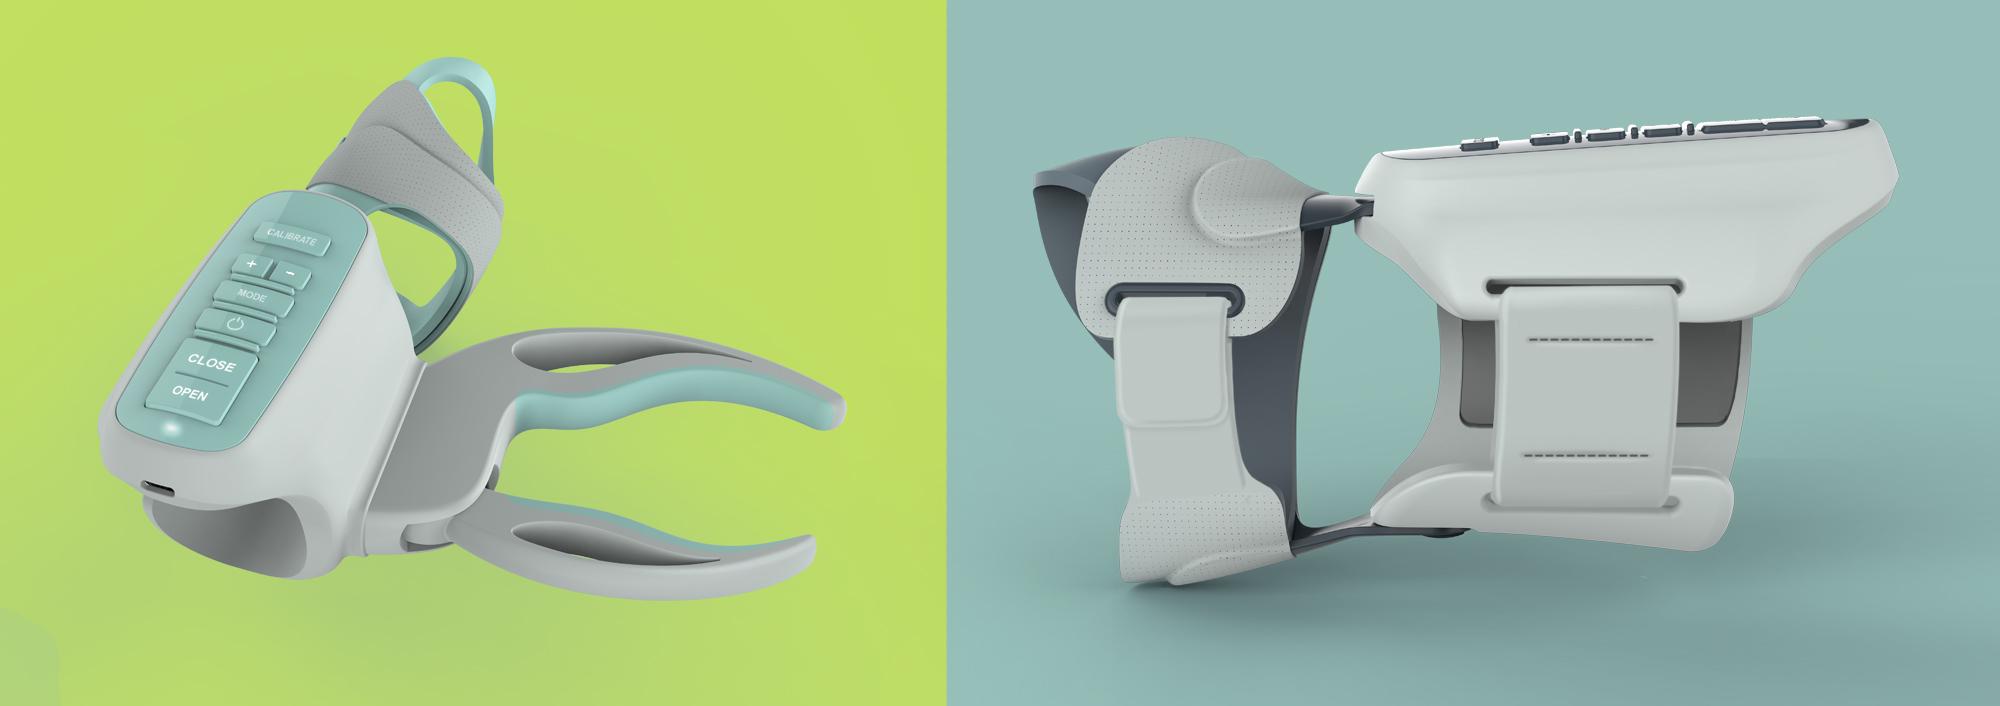 Boston-Incubation-center-robotic-arm-03